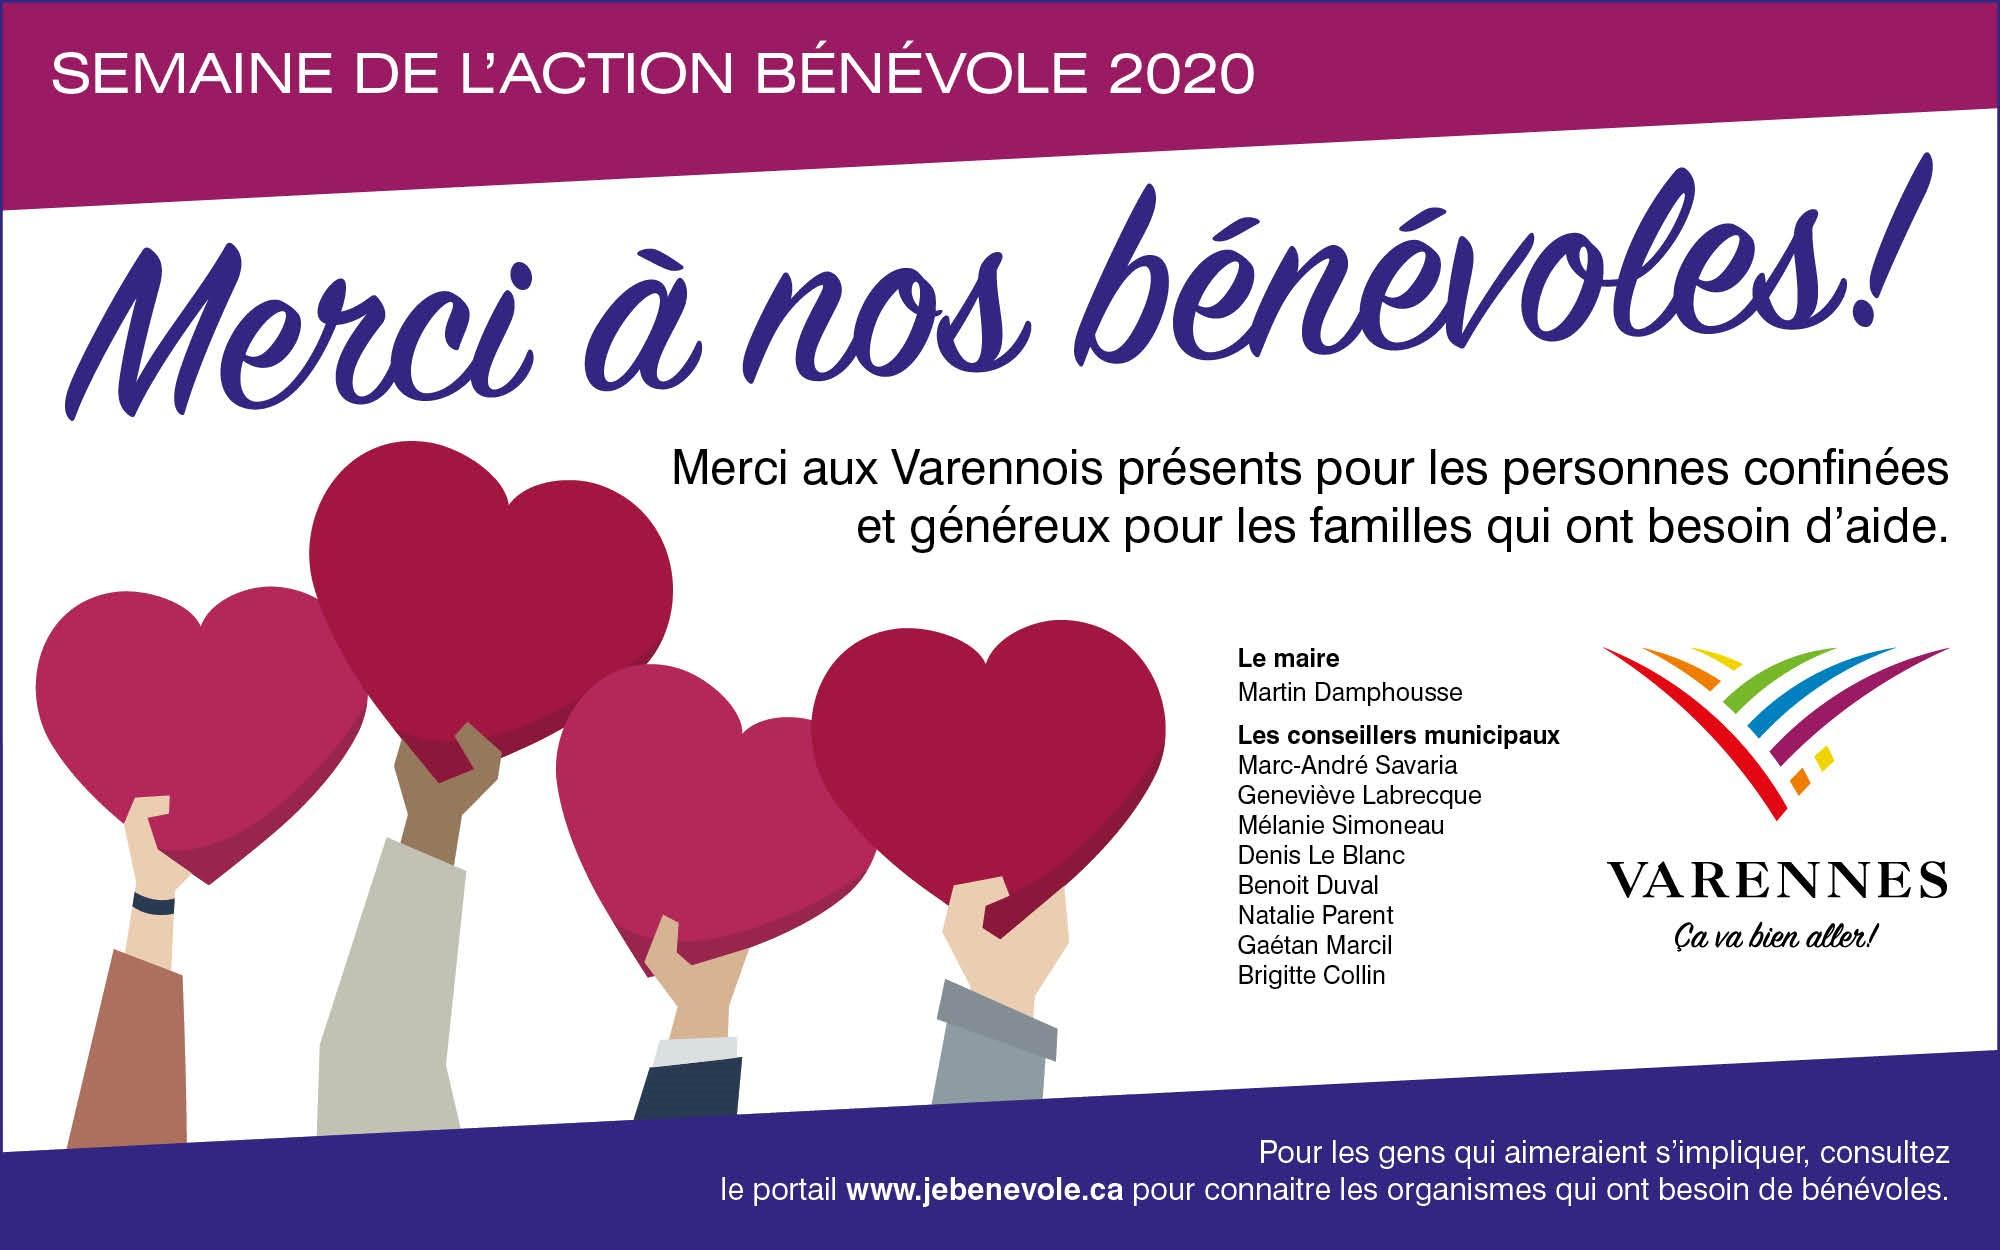 20200415_Semaine_action_benevole_merci.jpg (284 KB)